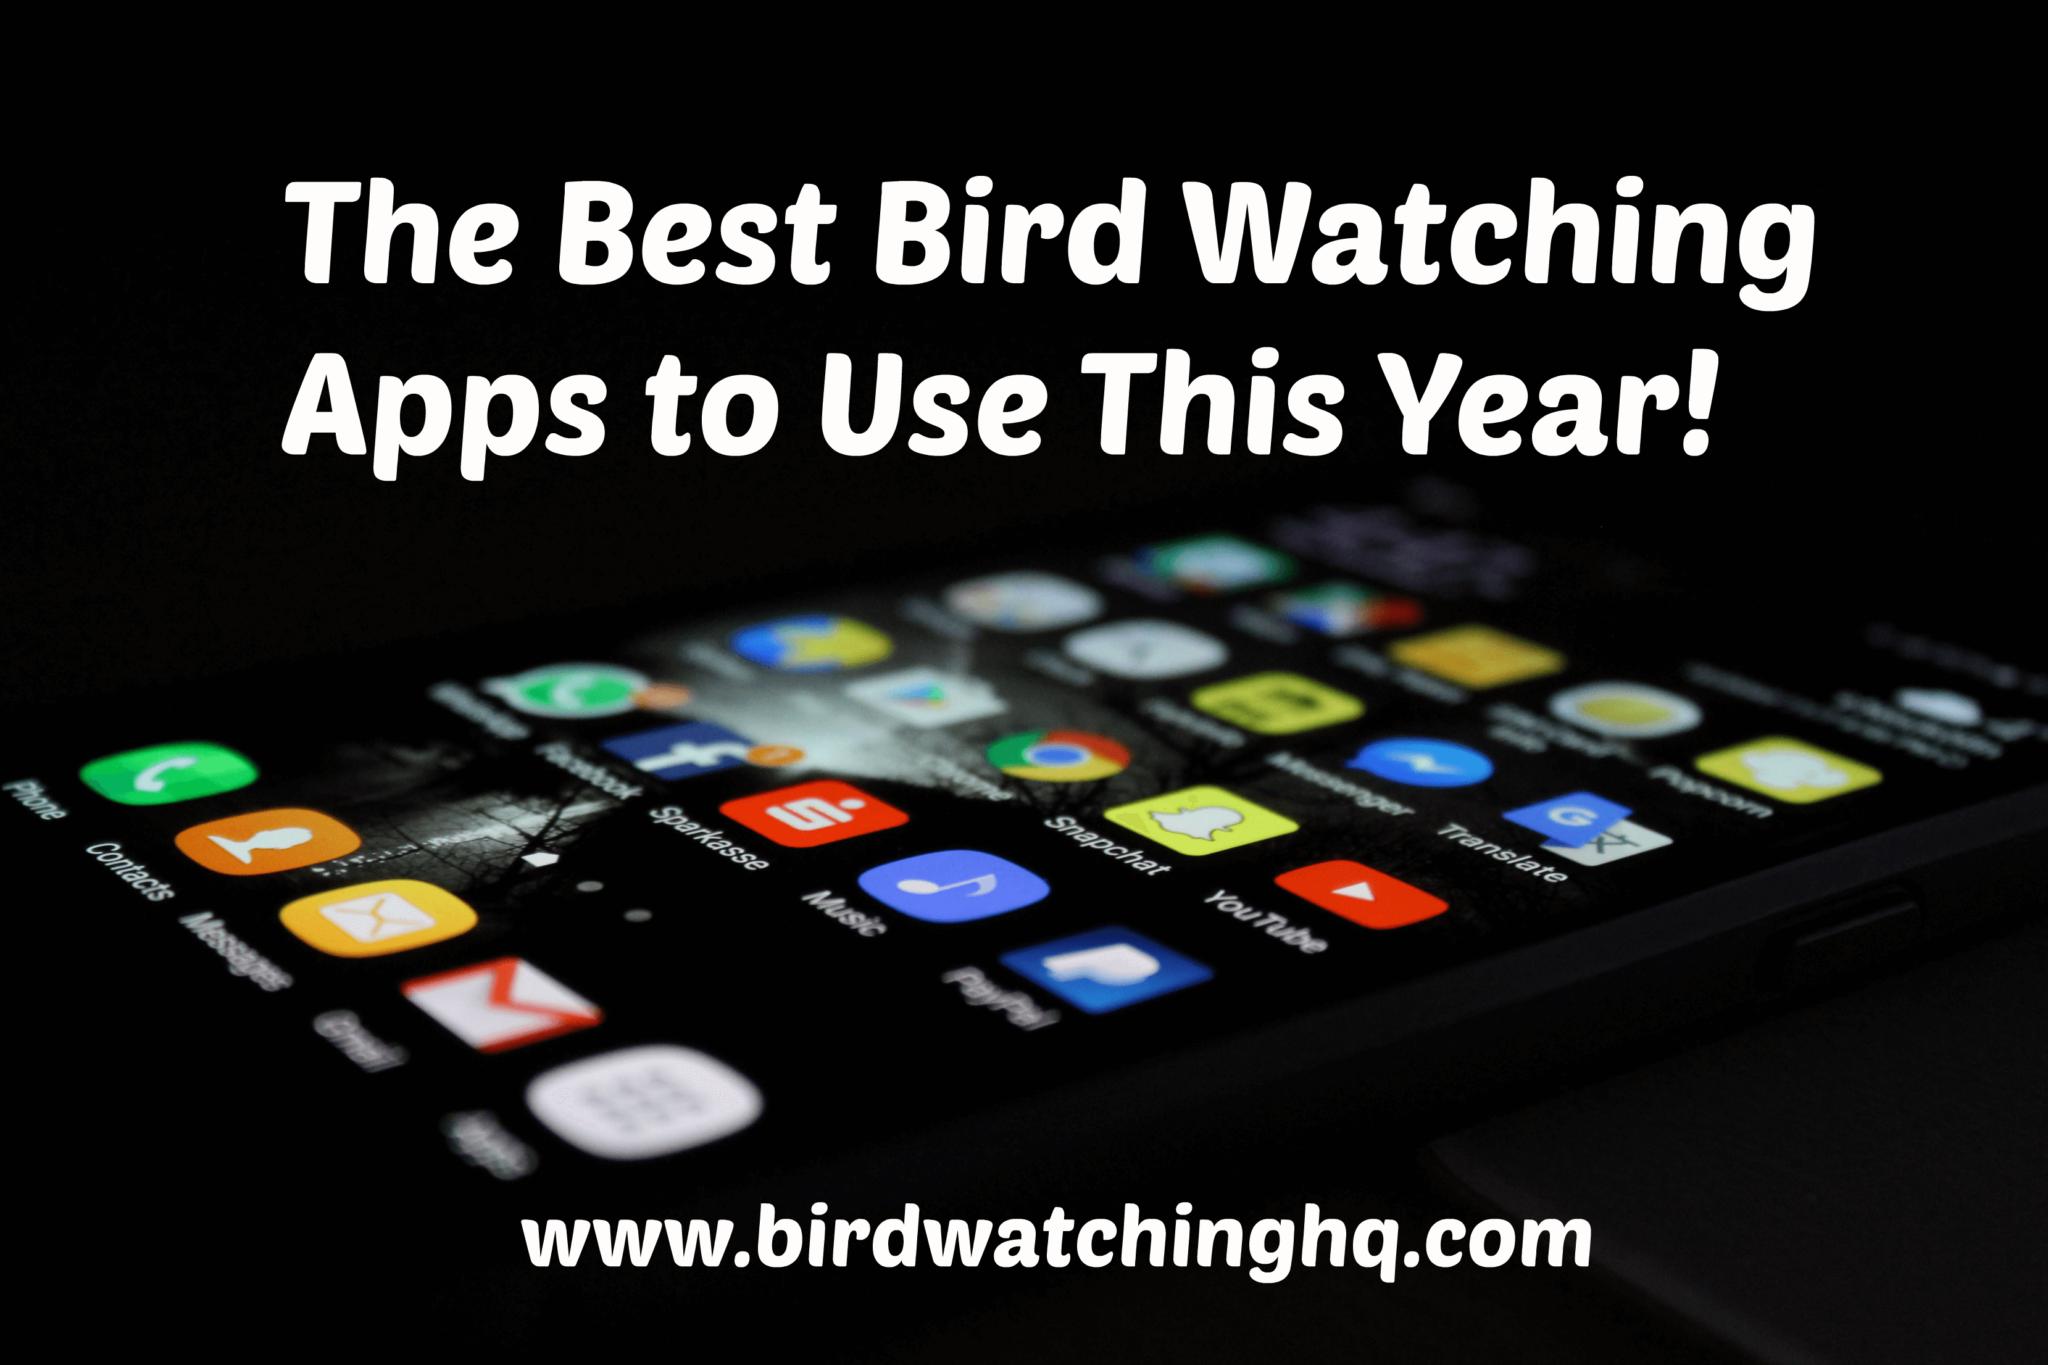 The 14 Best Bird Watching Apps (2019) - Bird Watching HQ